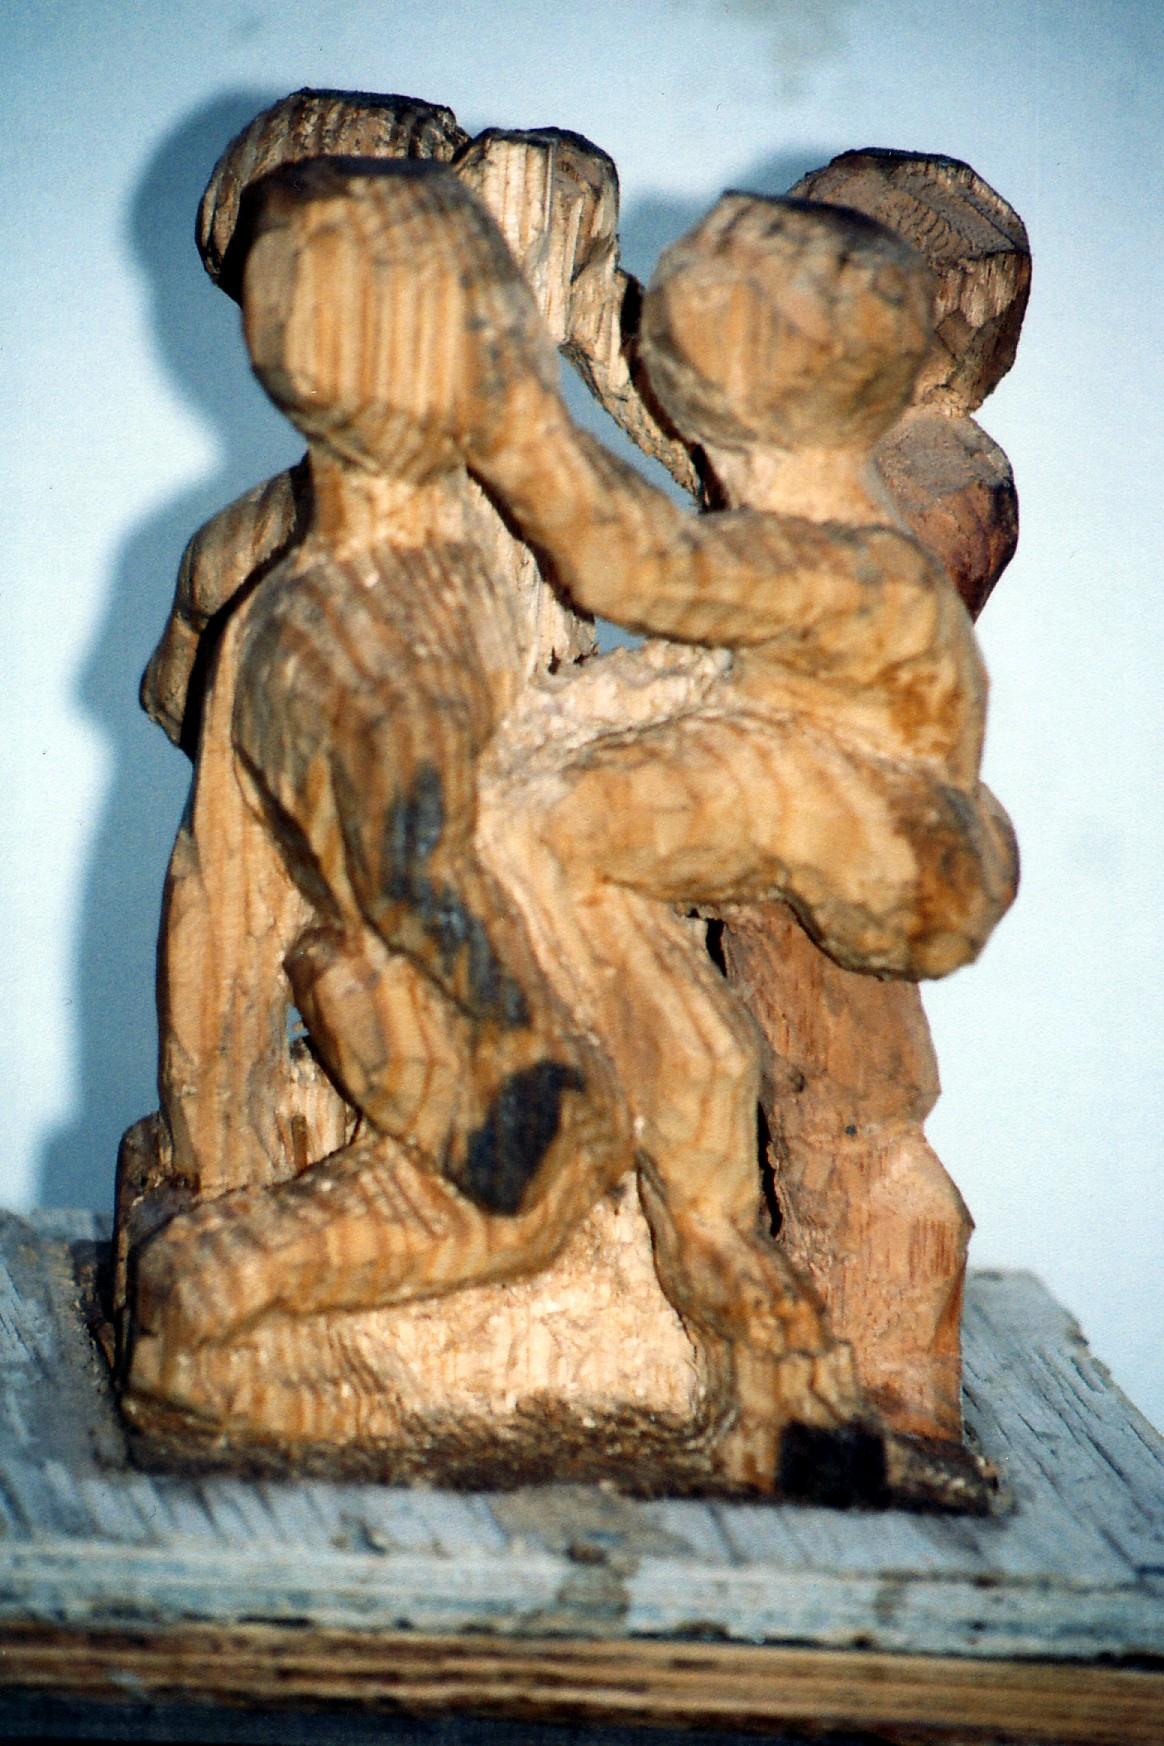 Isaac Nkululeko Makeleni - Boxers (unfinished). (Collection: M. Pissarra. Photo: MP)